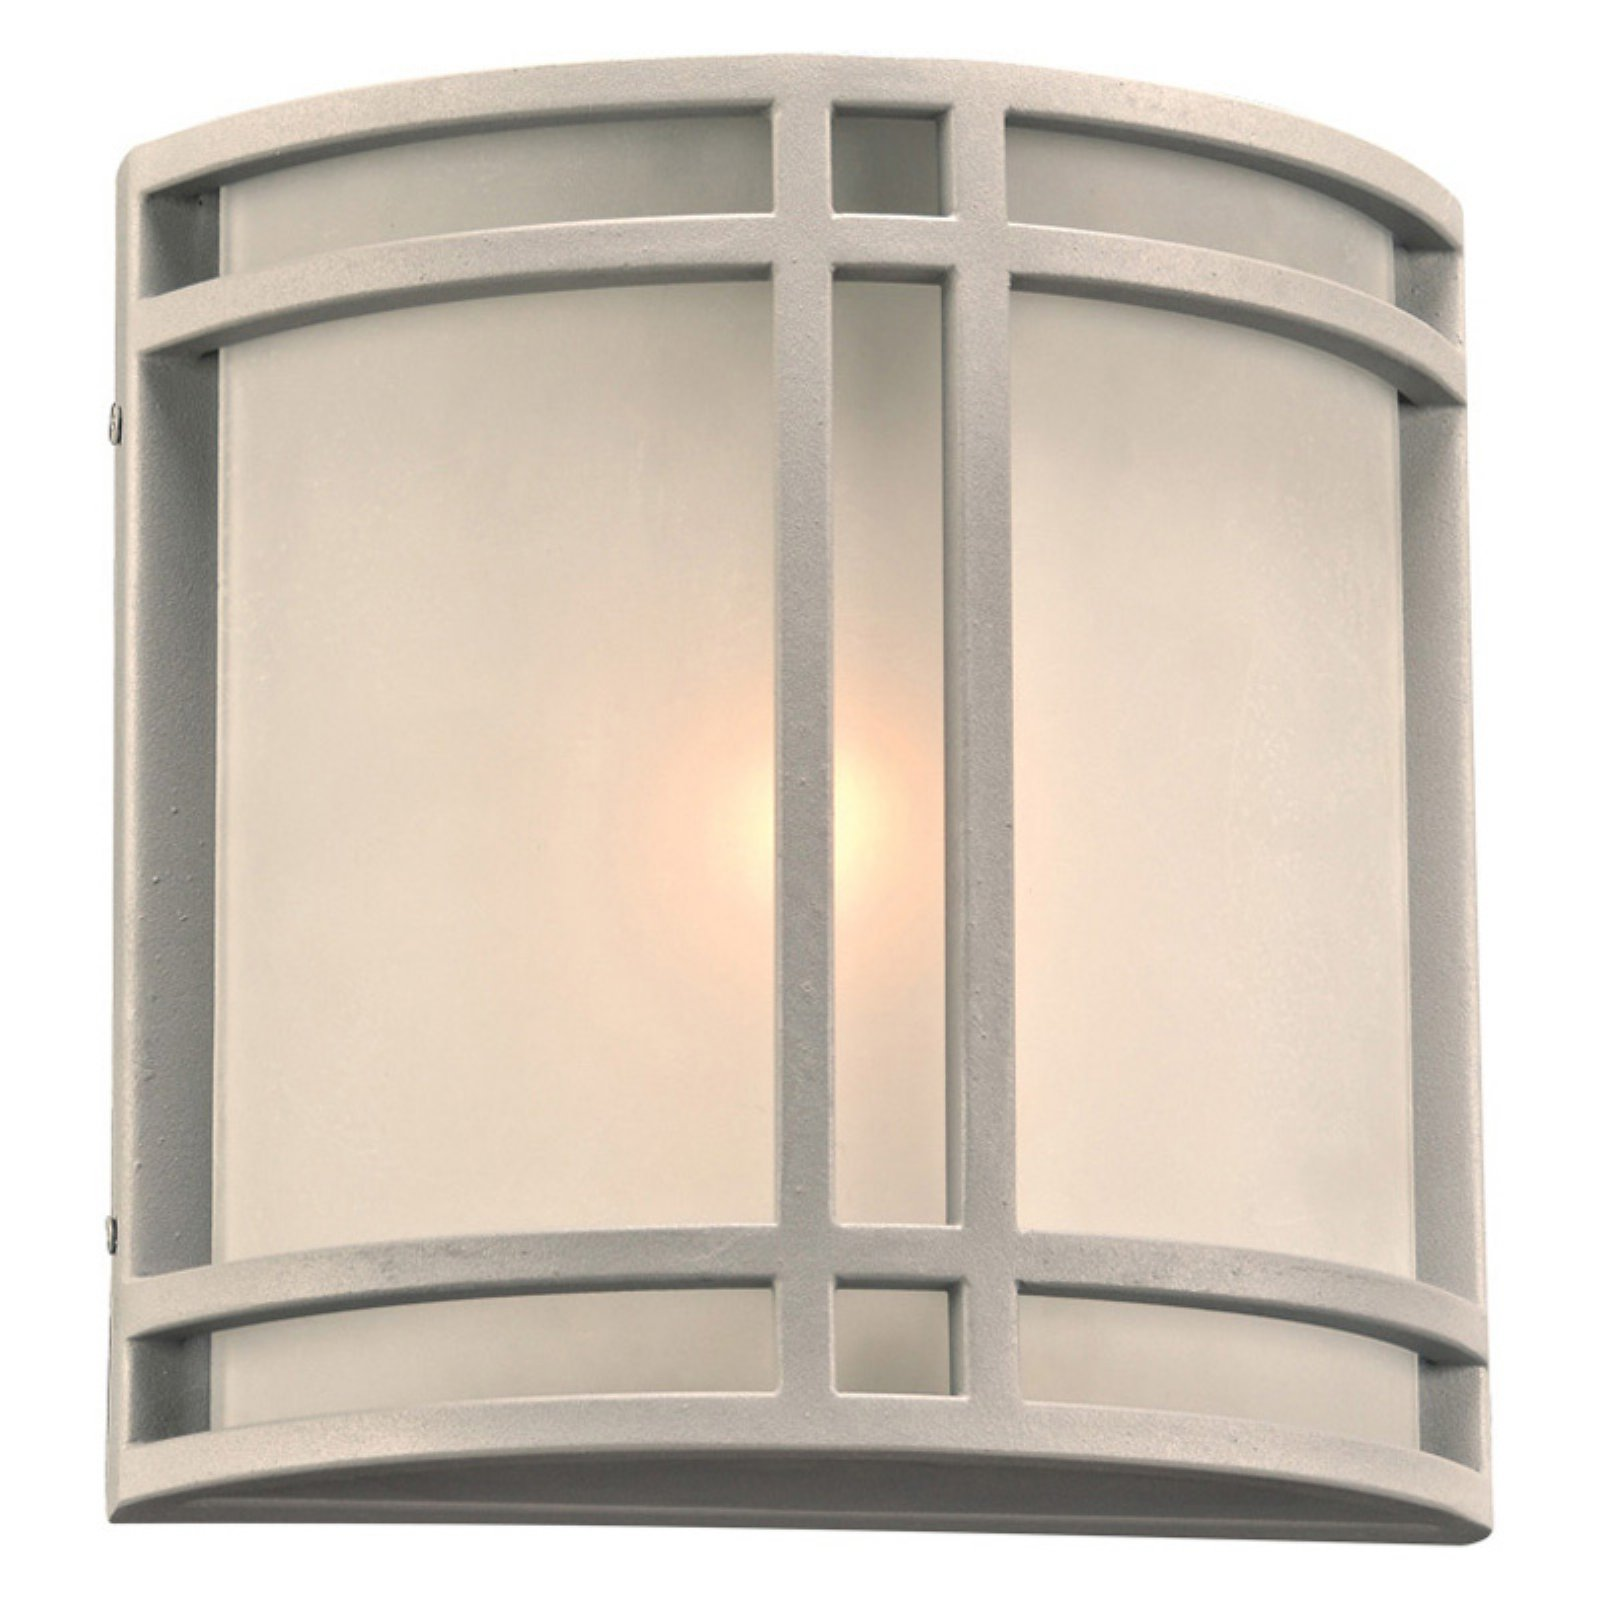 PLC Lighting Summa 8045 Outdoor Wall Light